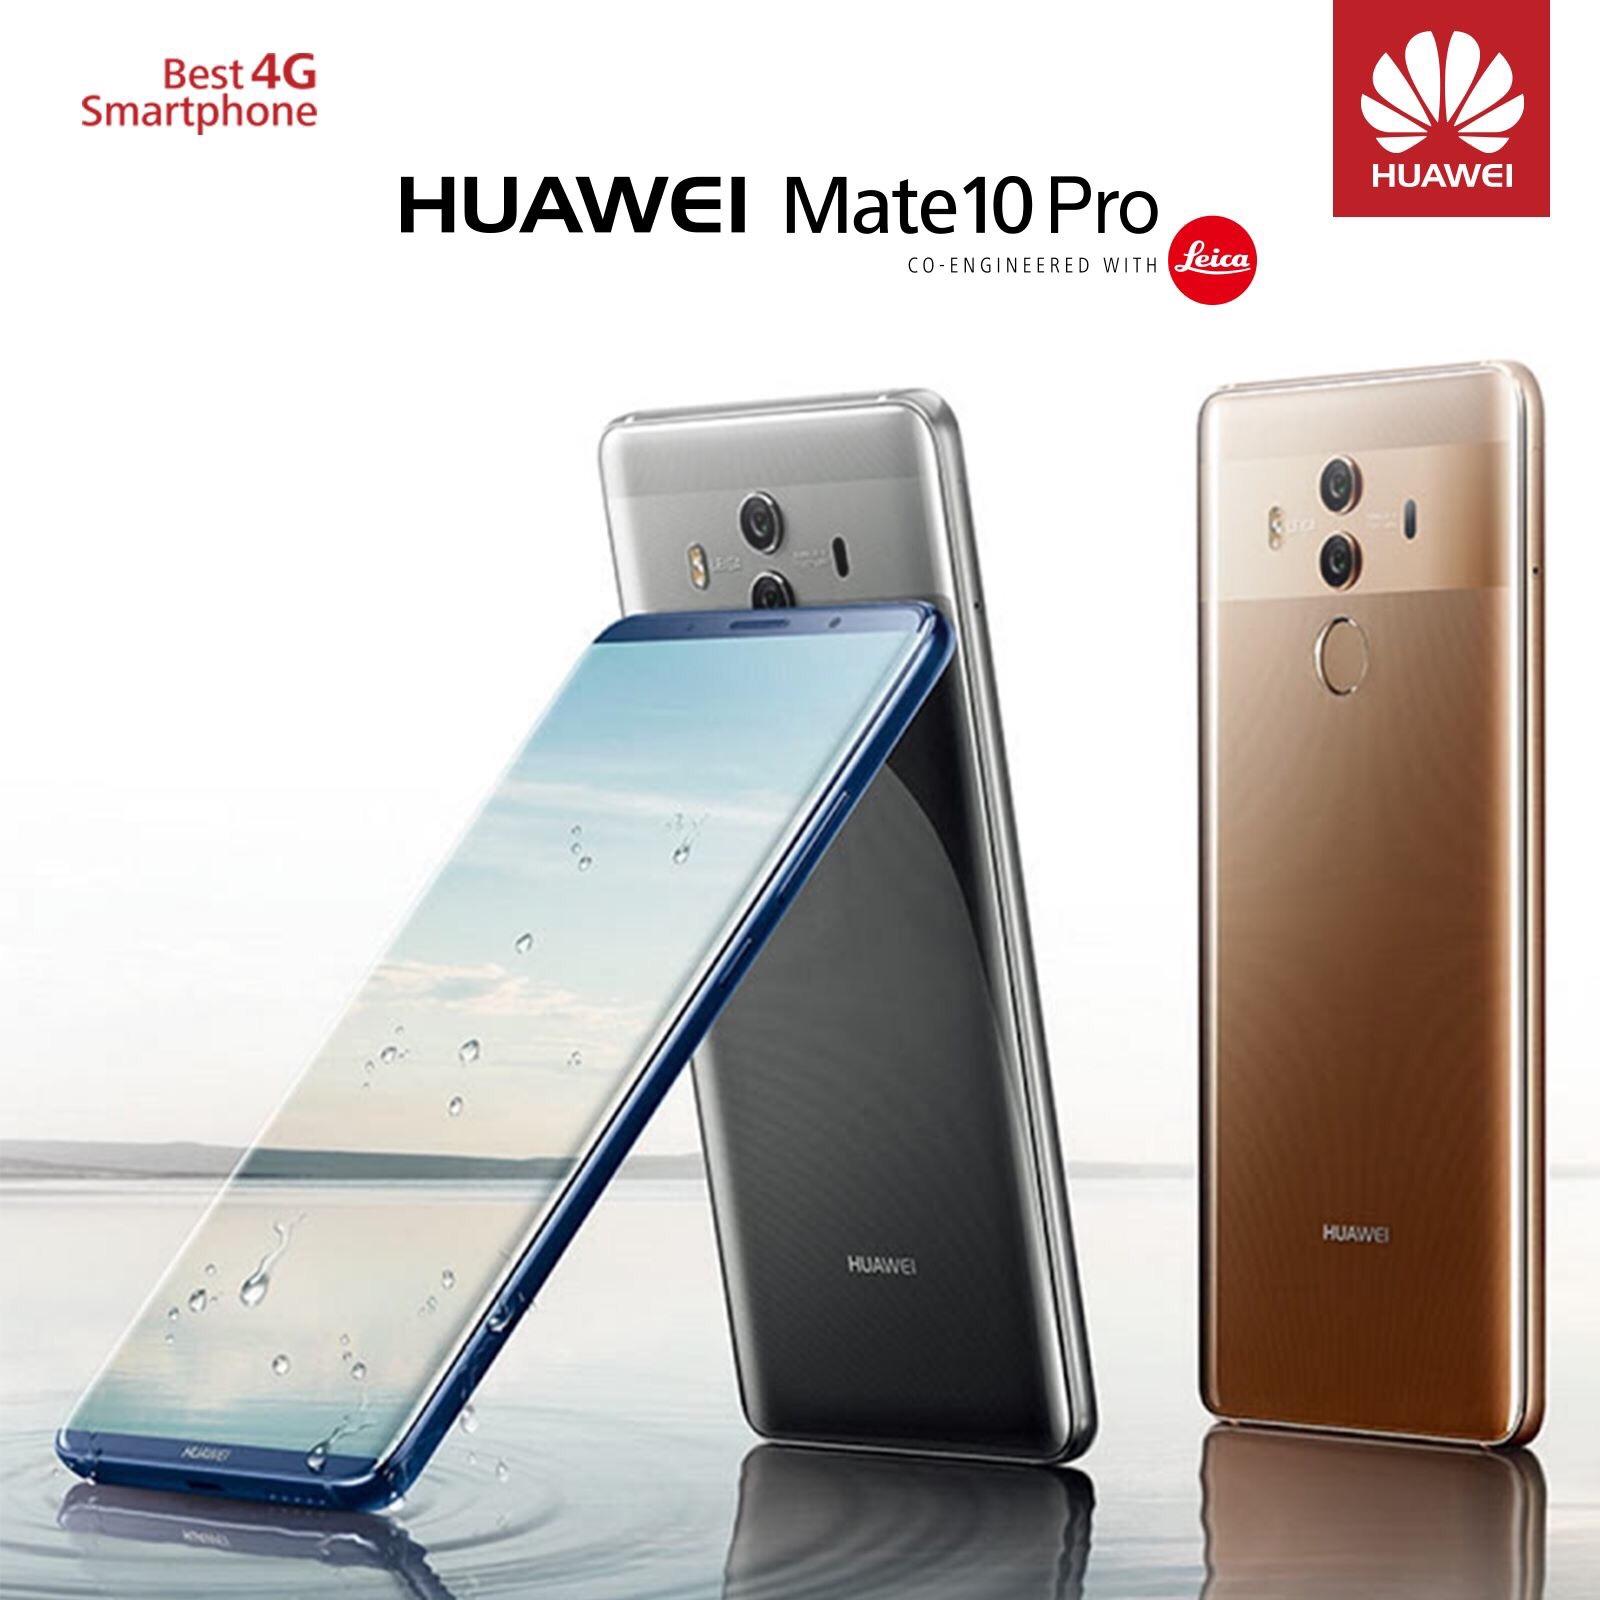 Huawei Mate 10 Pro unveiled in Bangladesh -